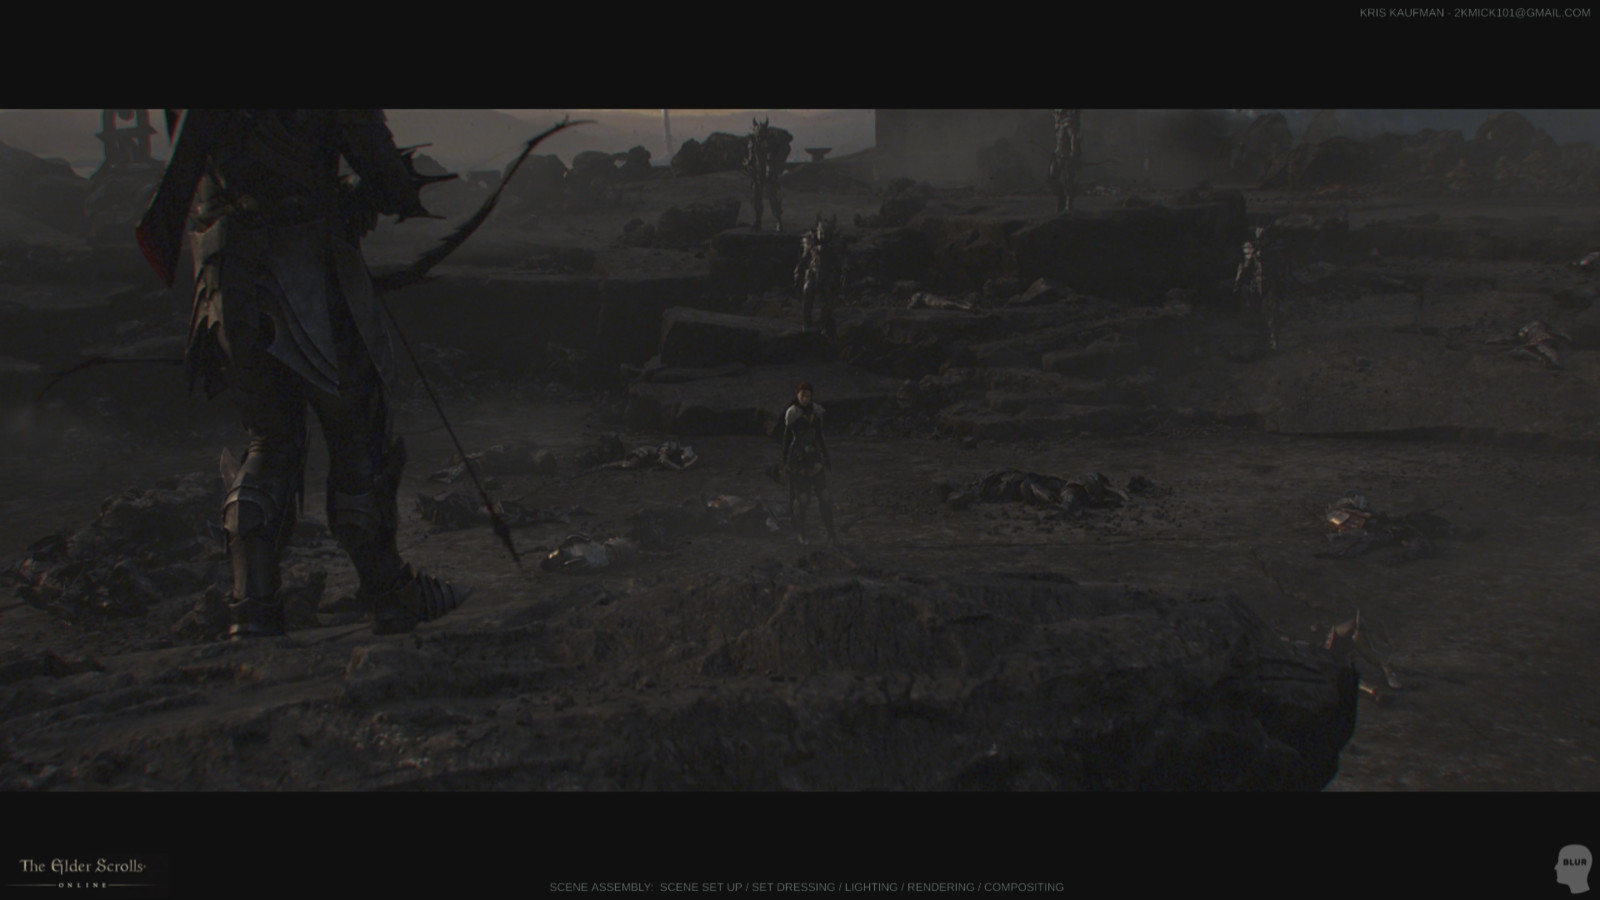 The Elder Scrolls Online: Set Dressing / Lighting / Rendering / Compositing